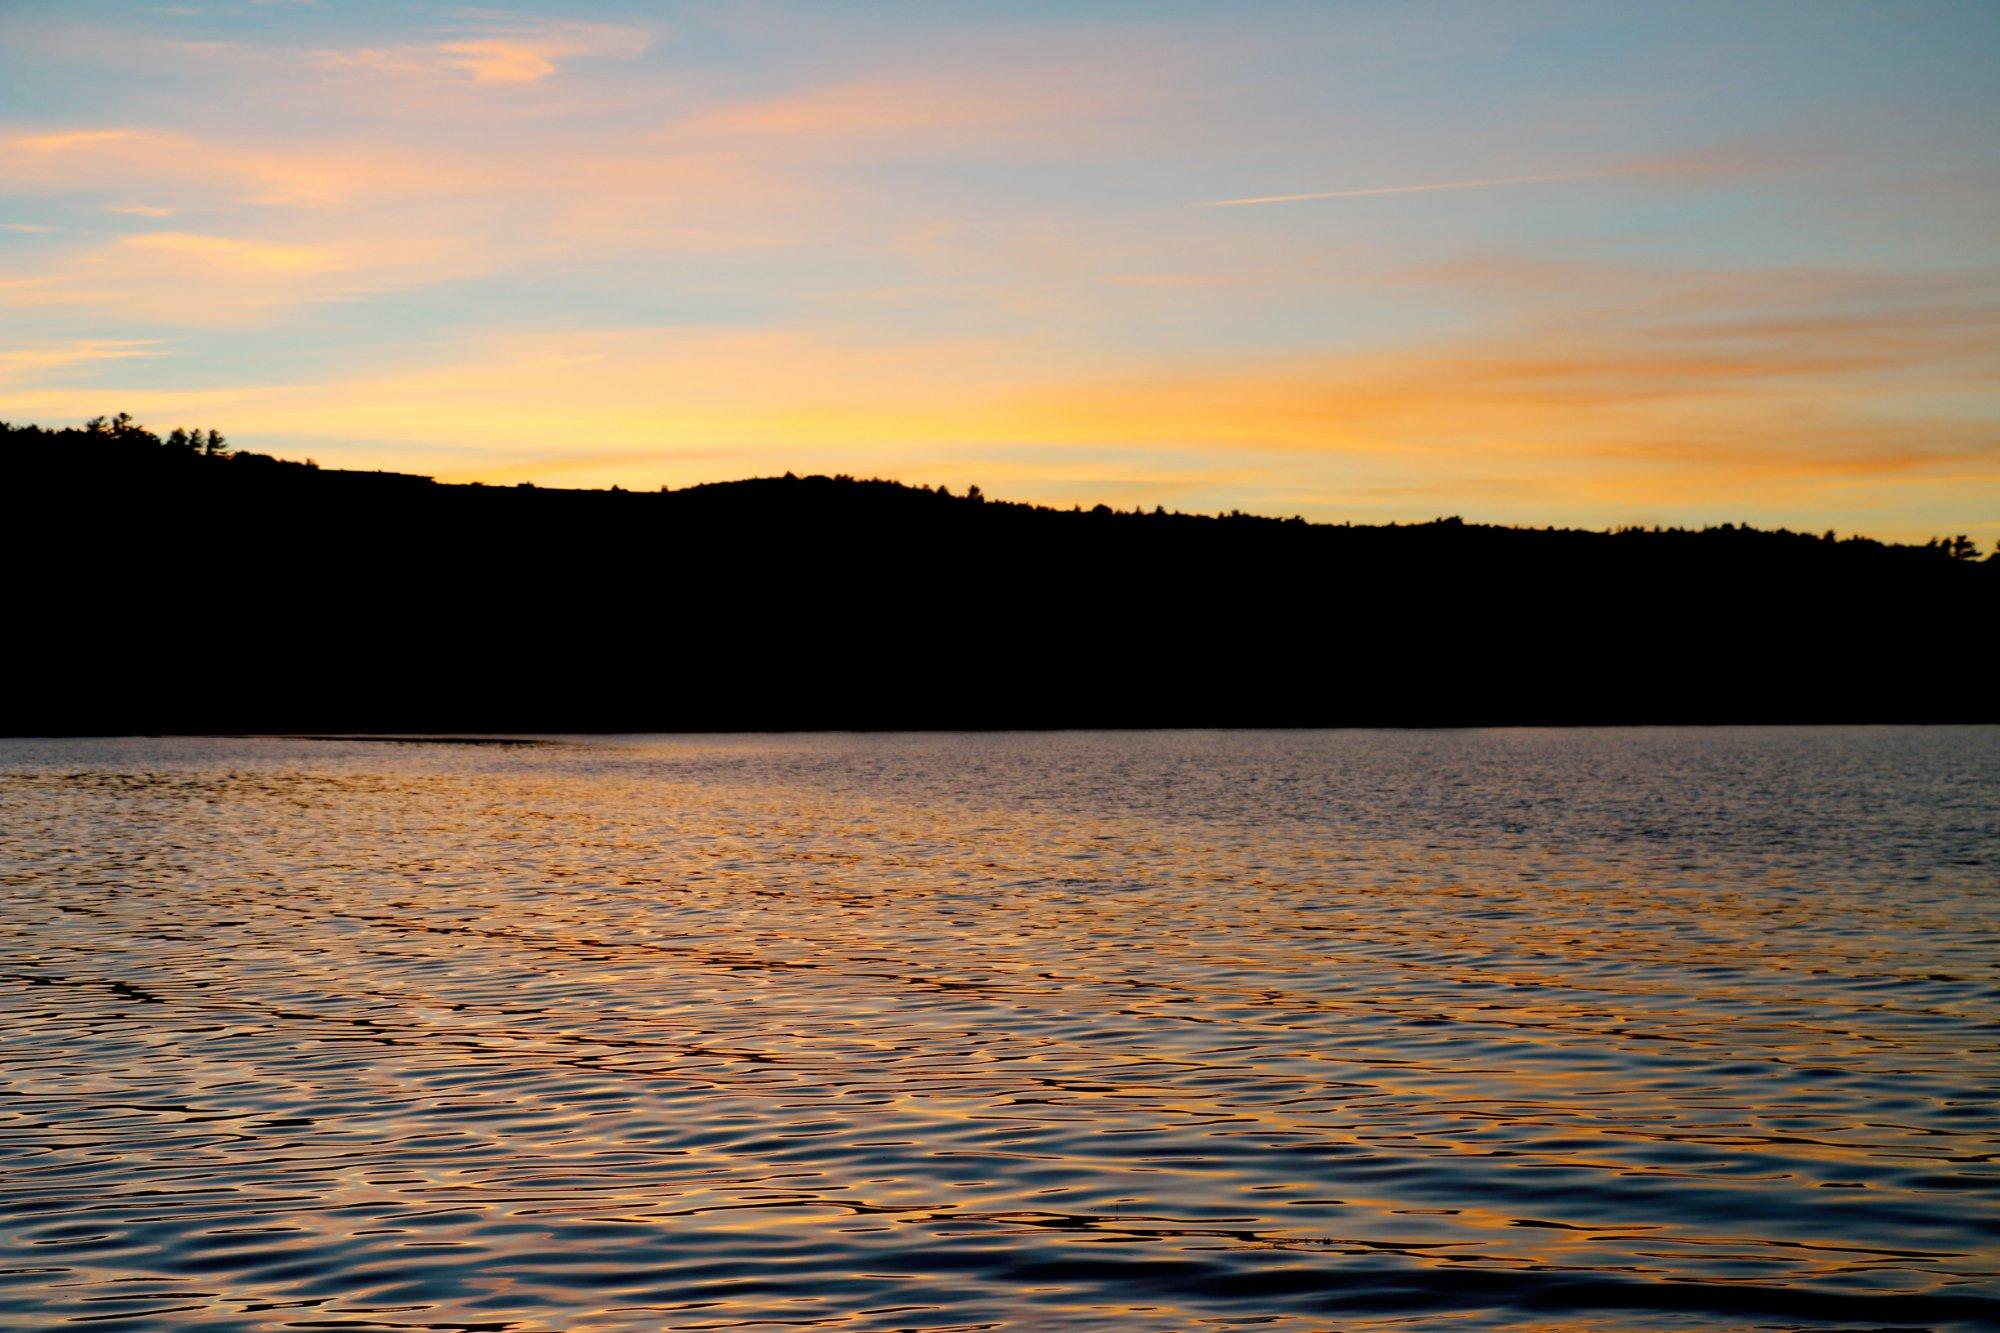 Acadia National Paark